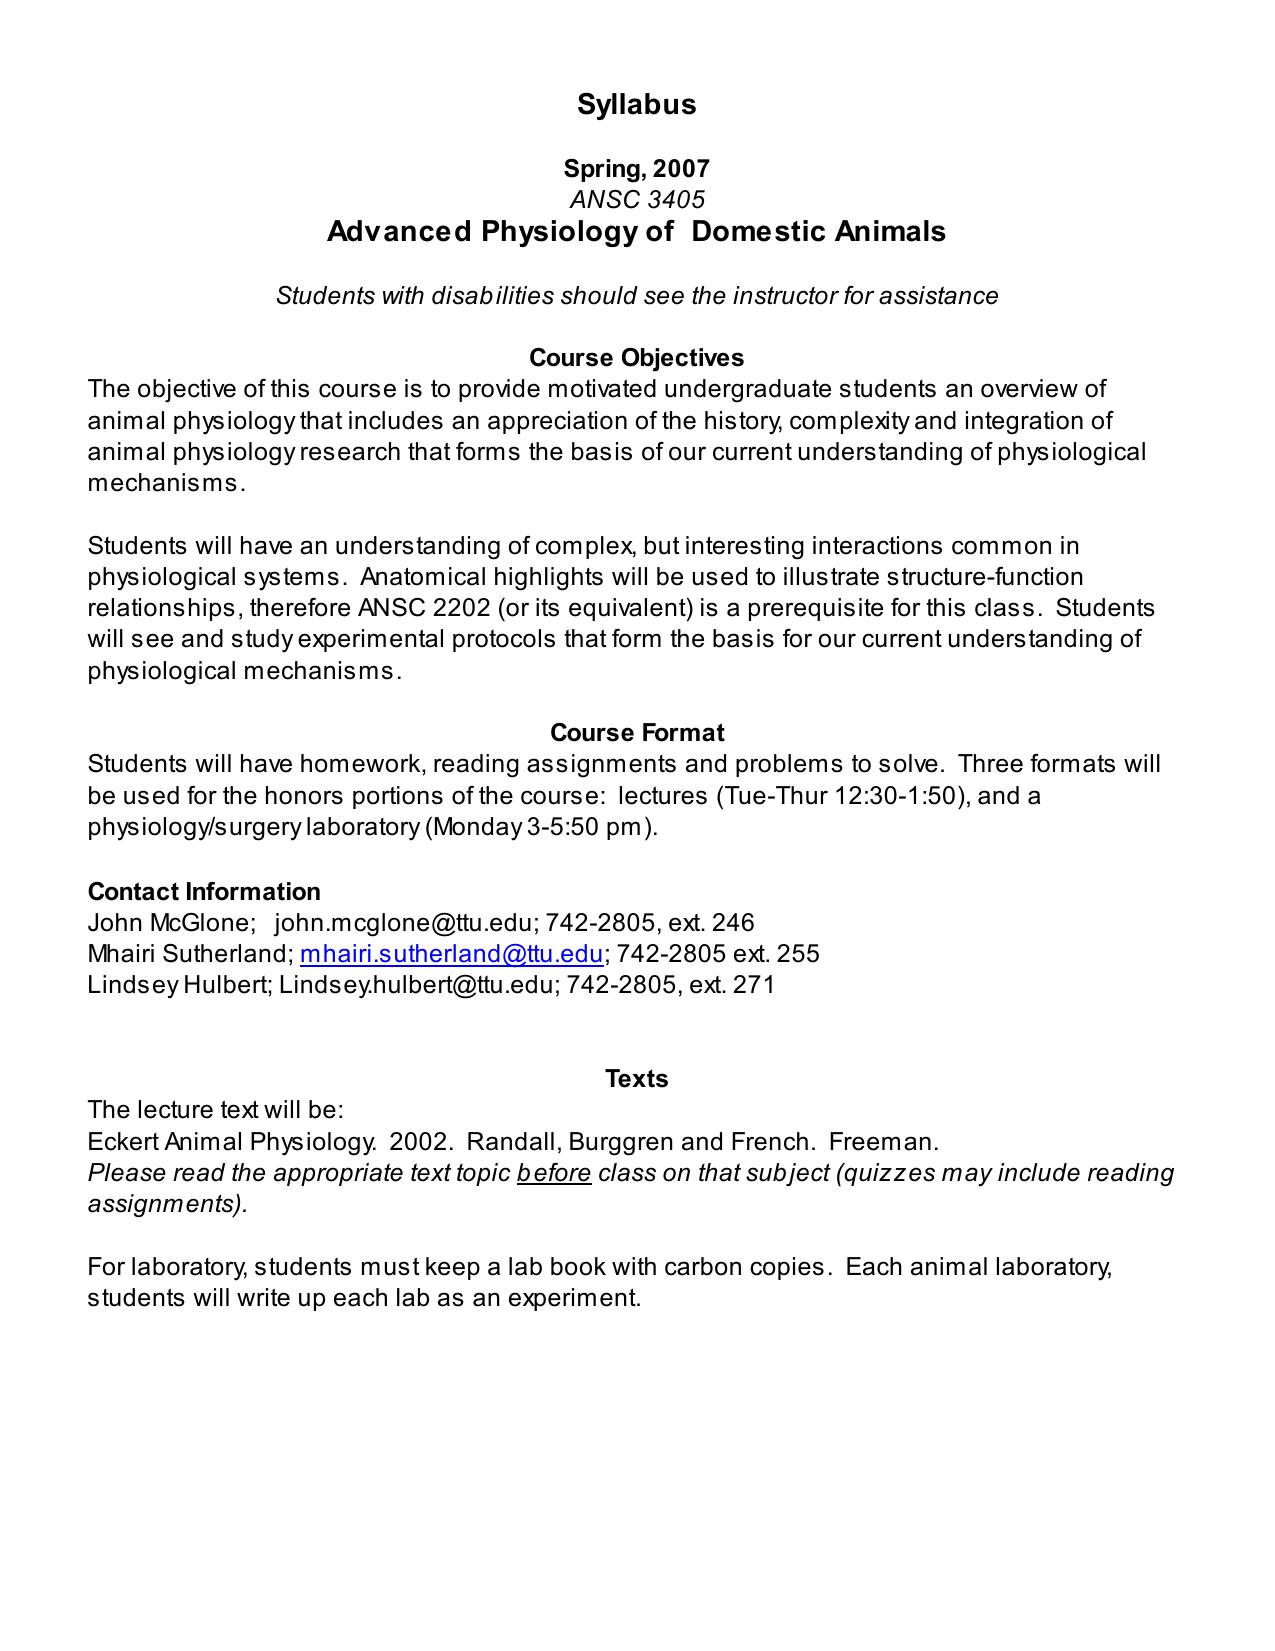 Syllabus Advanced Physiology of Domestic Animals